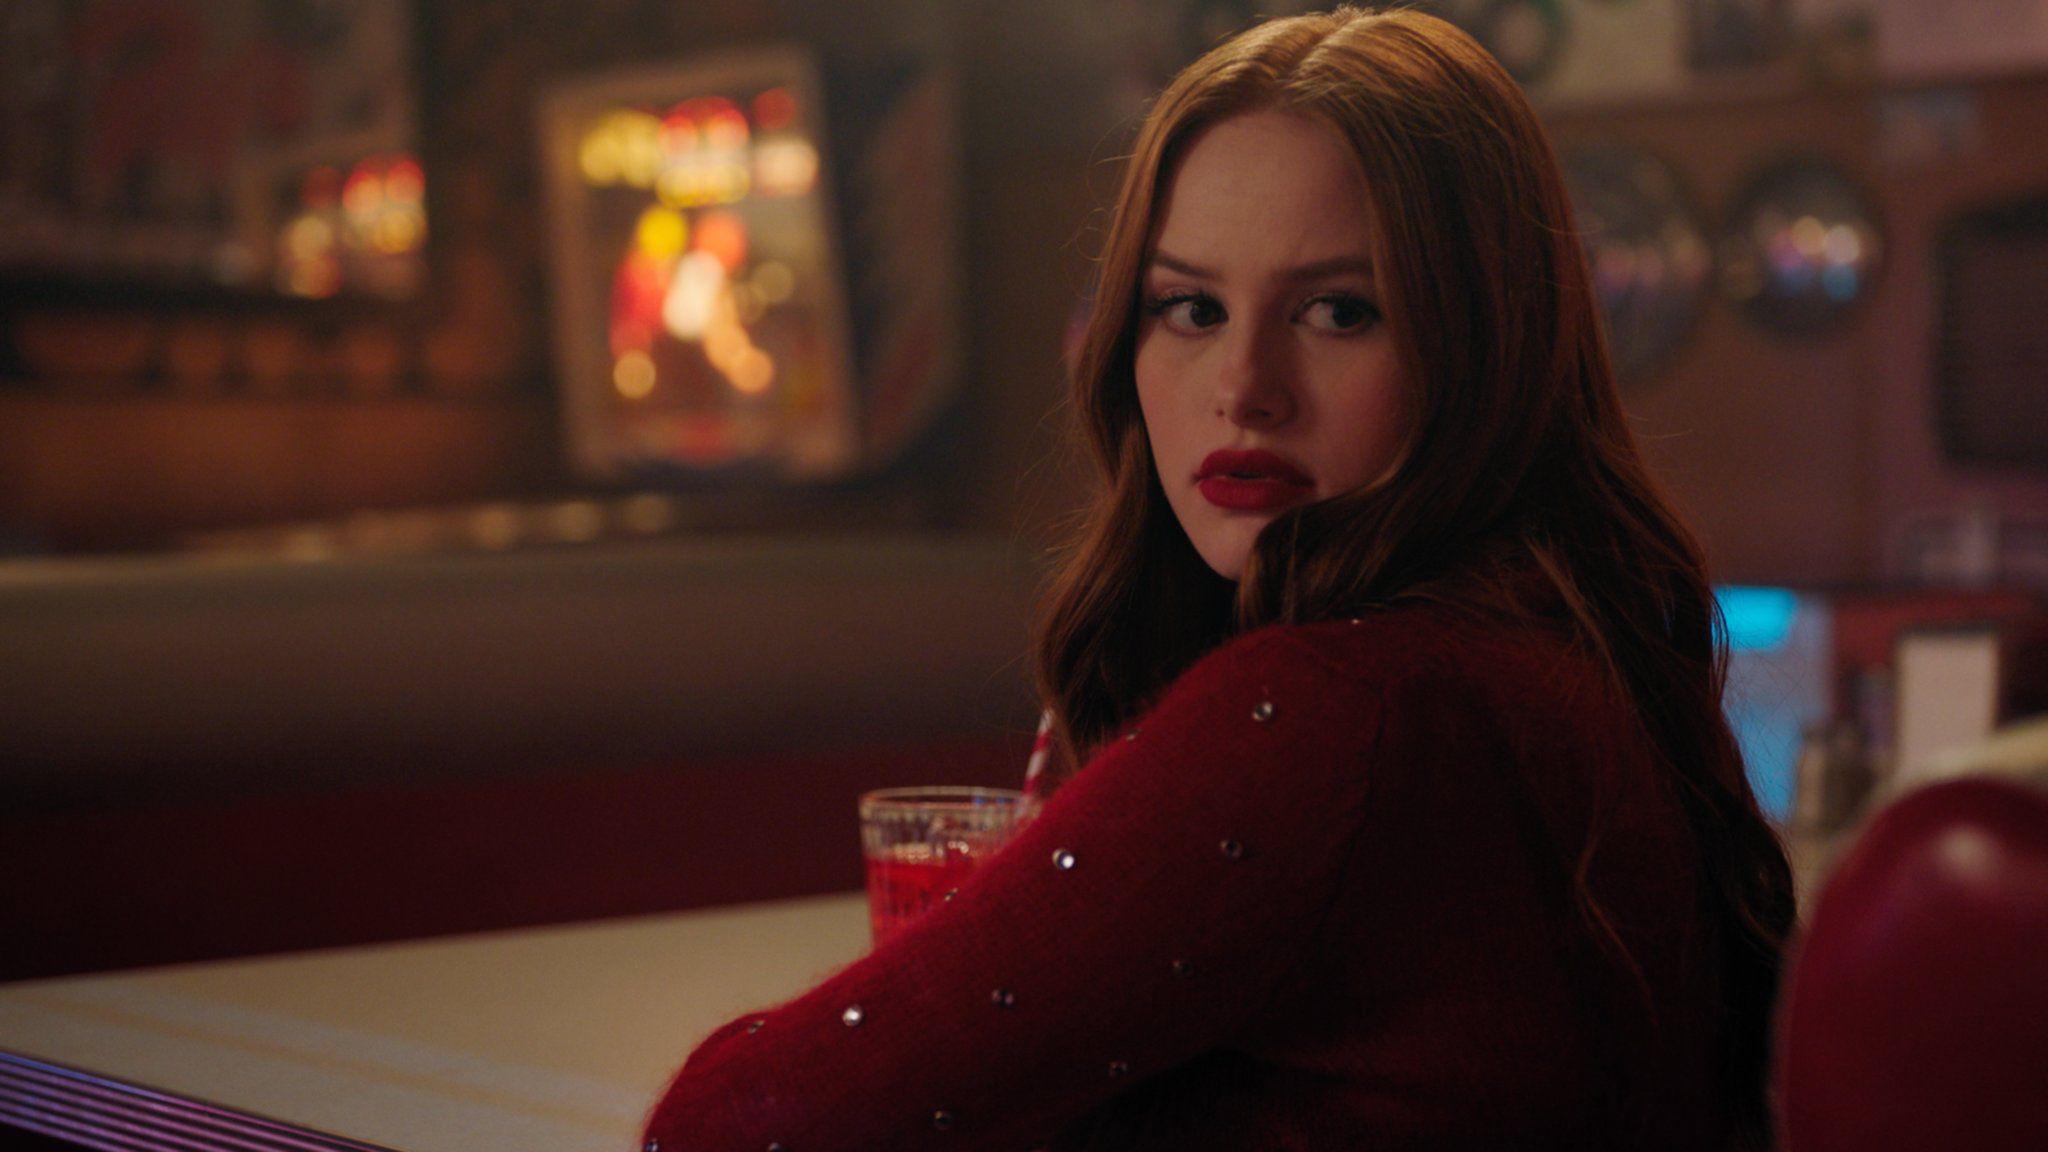 Pin by 🏳️🌈 on Riverdale in 2020 Riverdale, Cheryl